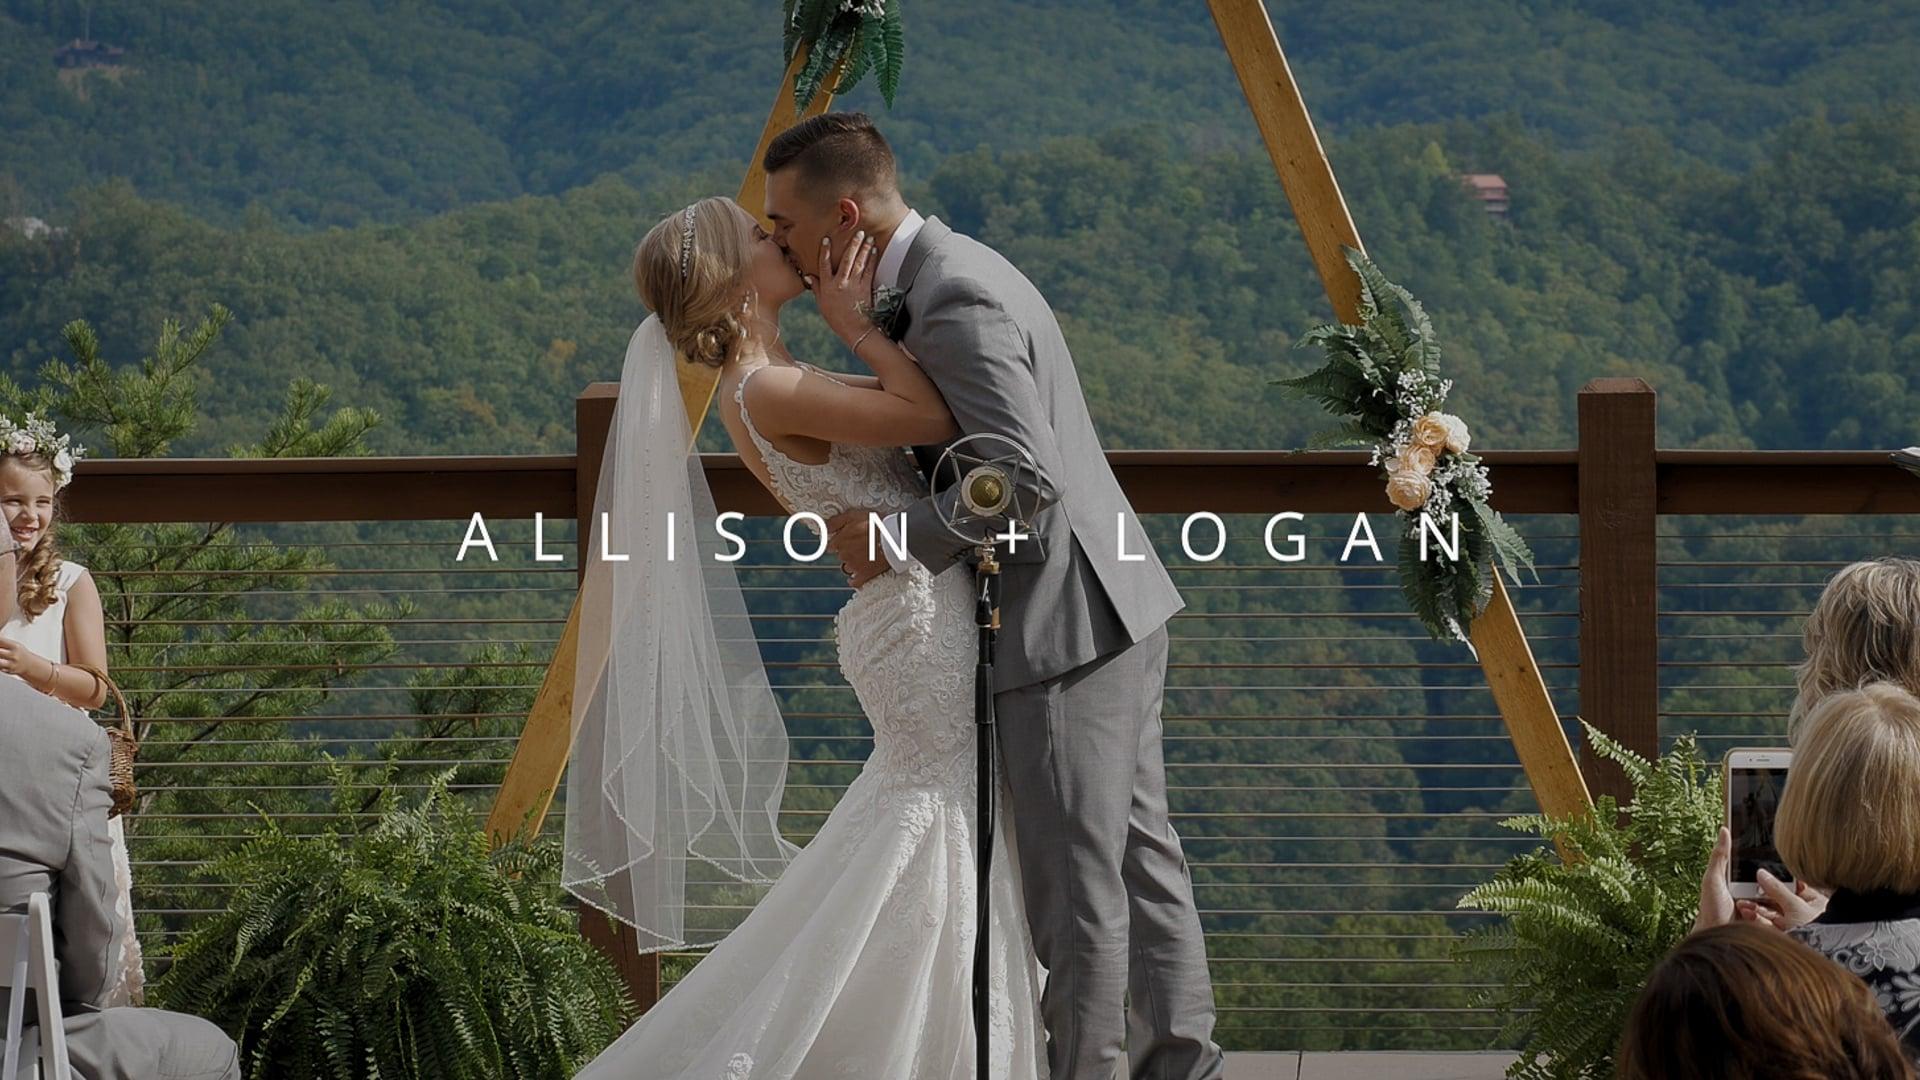 Allison & Logan: Wedding Documentary